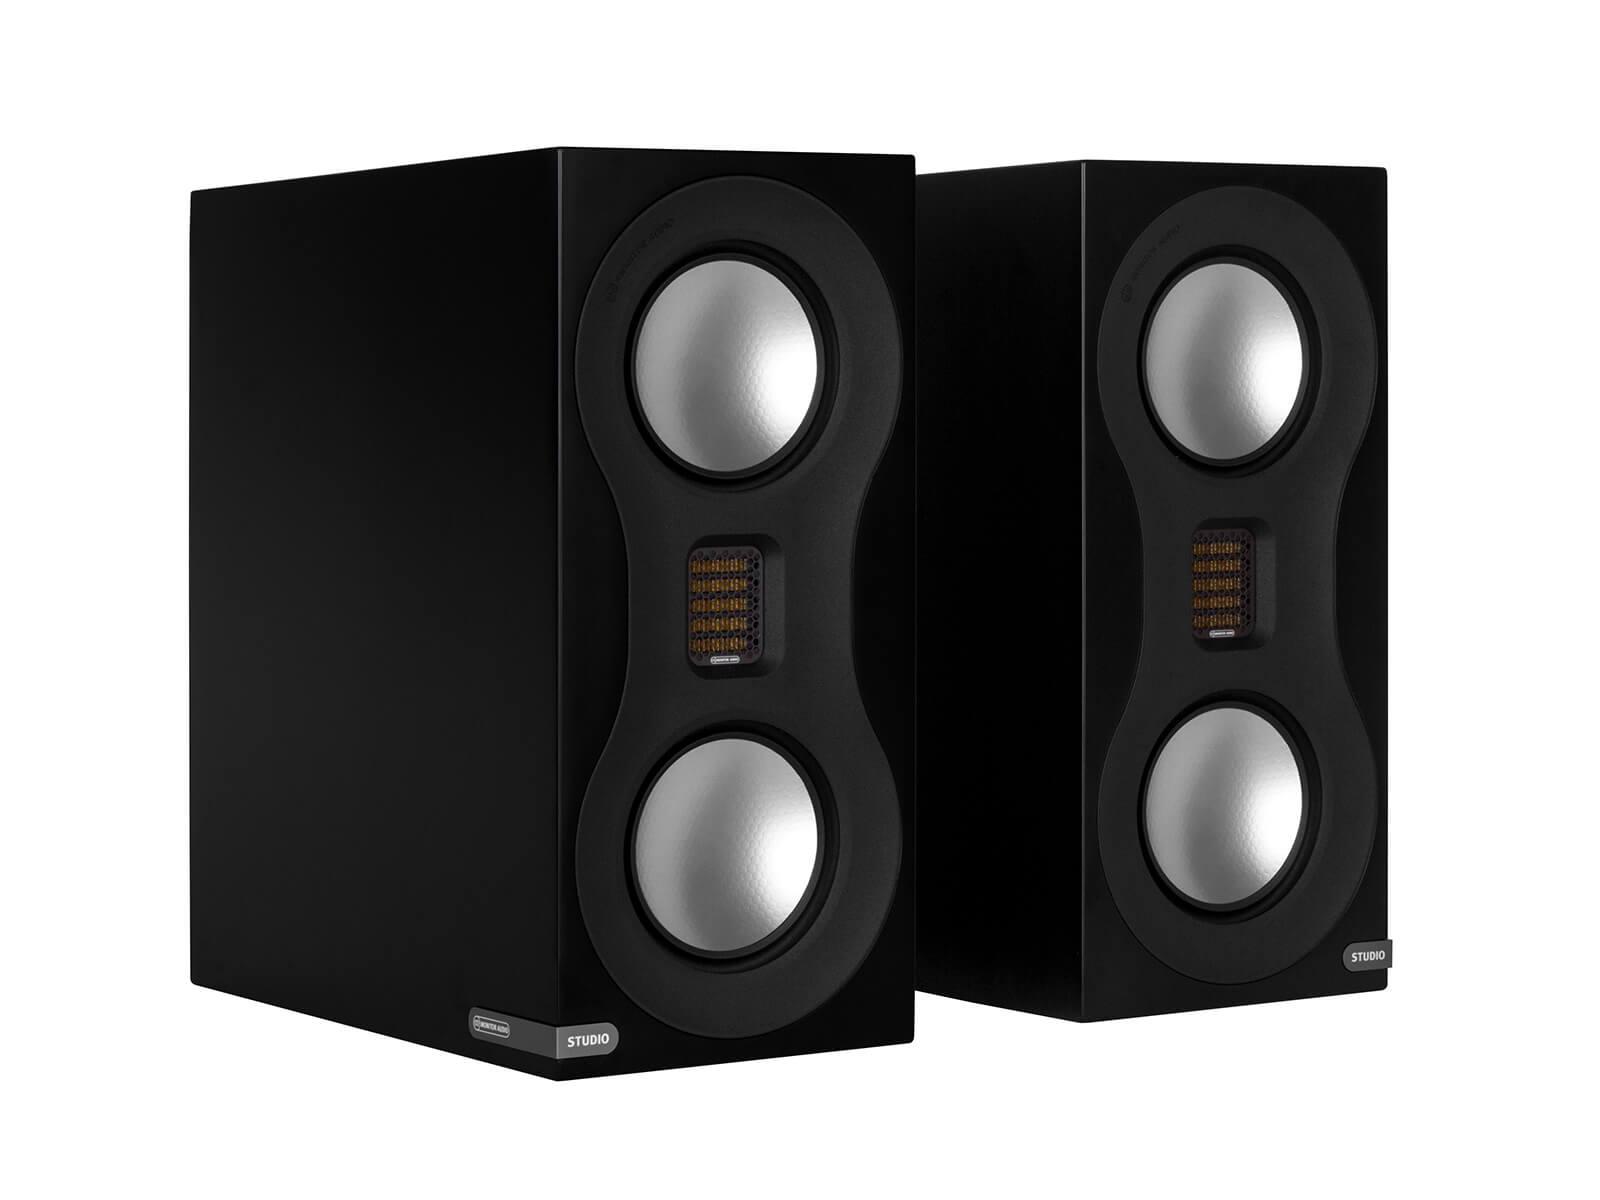 studio black pair - MONITOR AUDIO(モニターオーディオ)スピーカーStudioの試聴レビュー【10万円台】